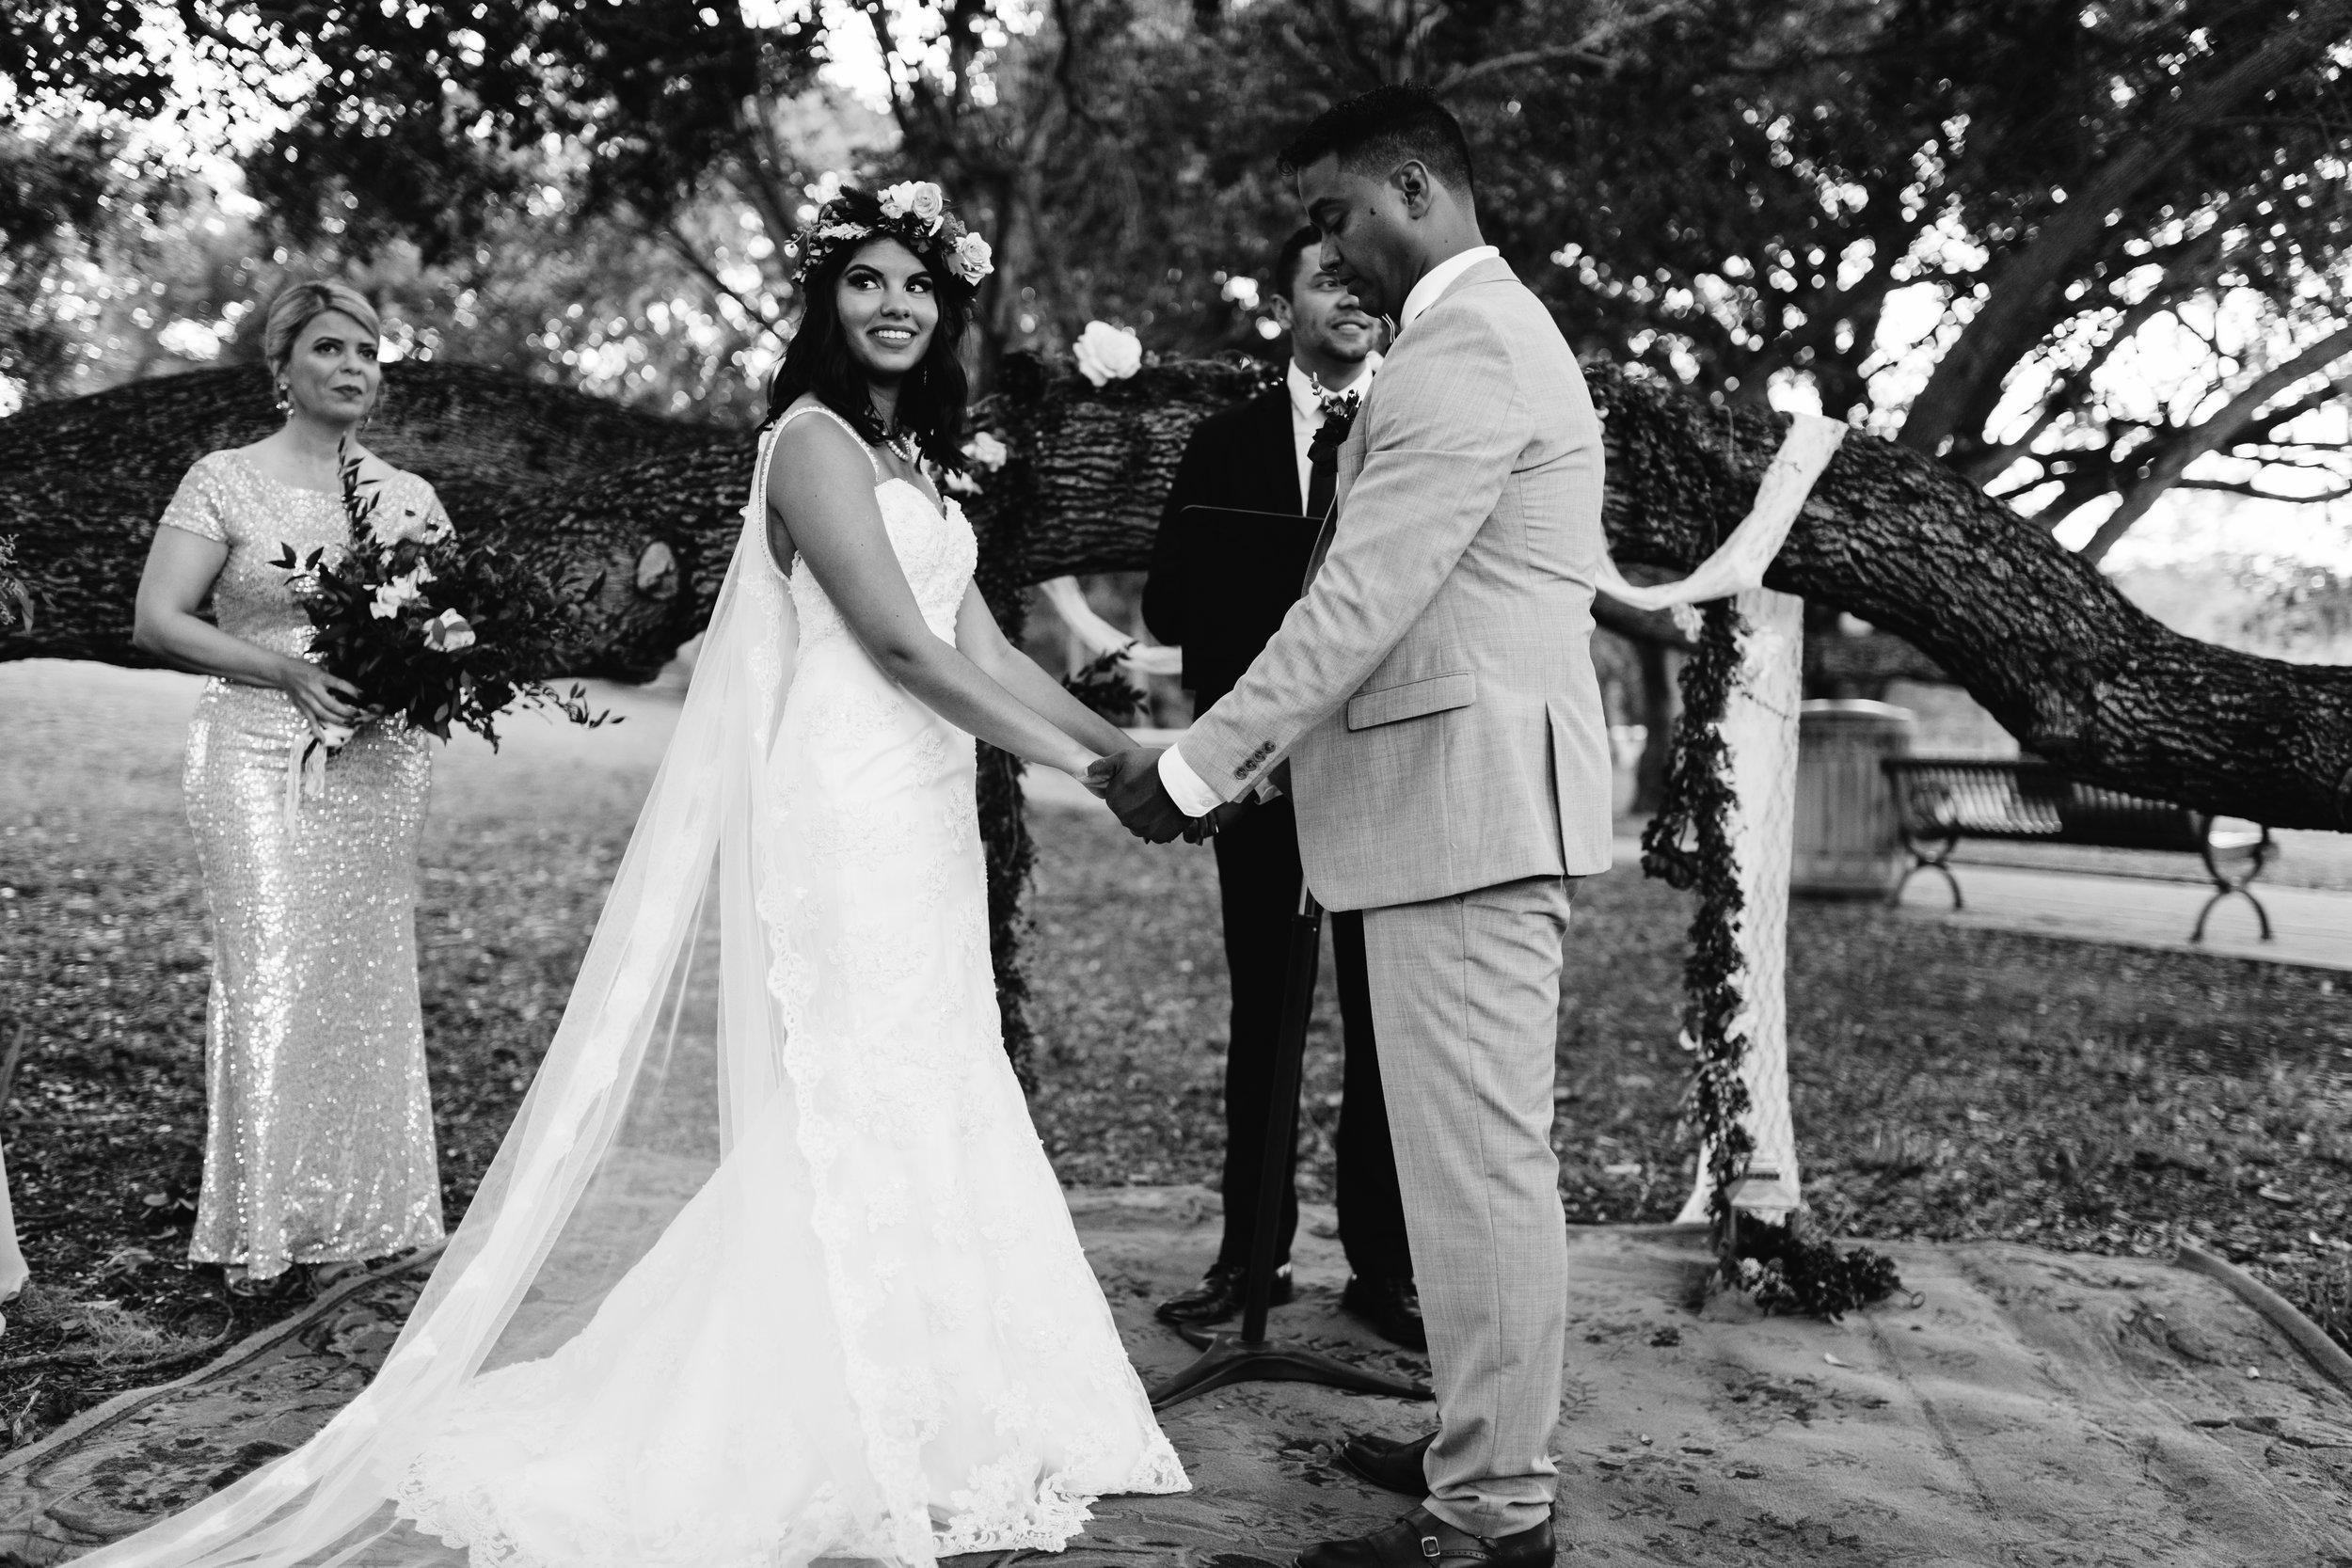 2017.05.23 Barbara and Mauricio Sales Port St Lucie Wedding (368 of 772).jpg